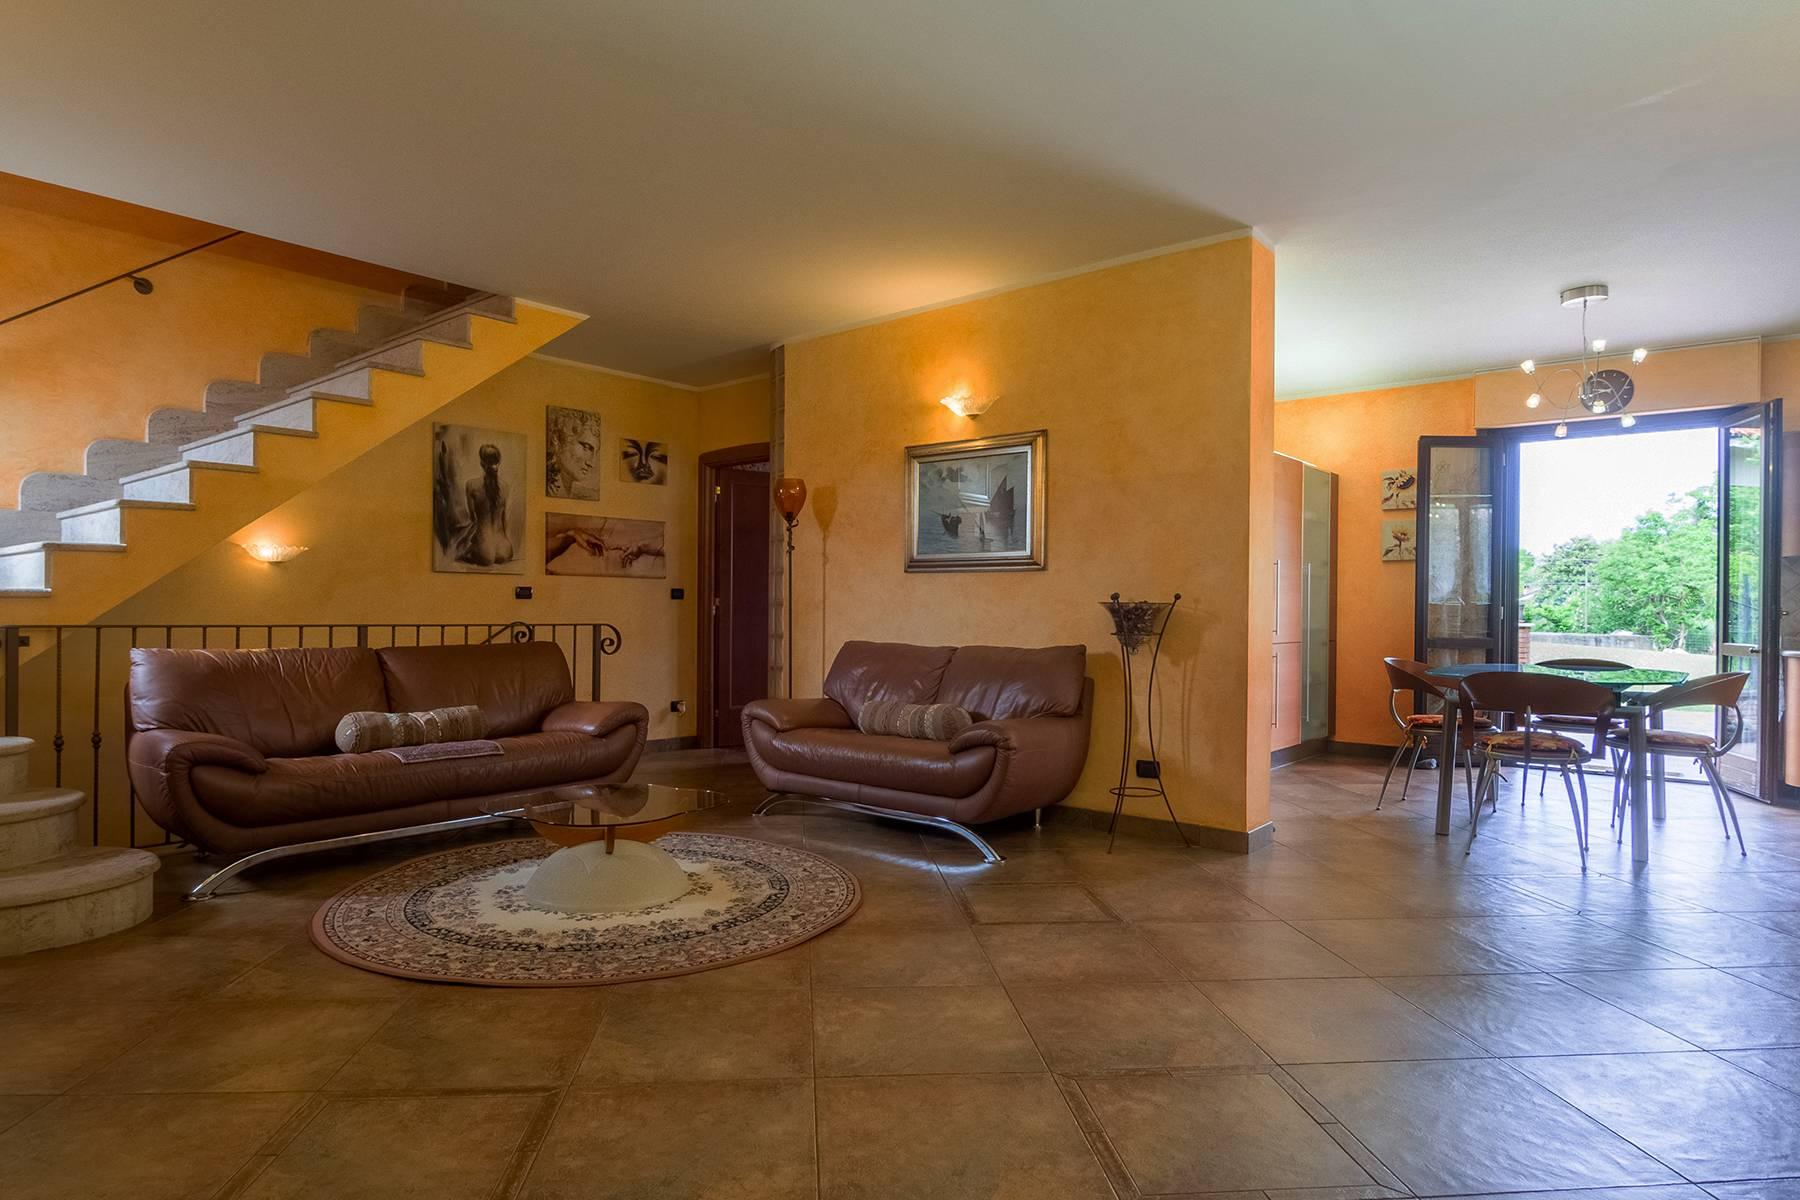 Villa in Vendita a Rosta: 5 locali, 182 mq - Foto 10